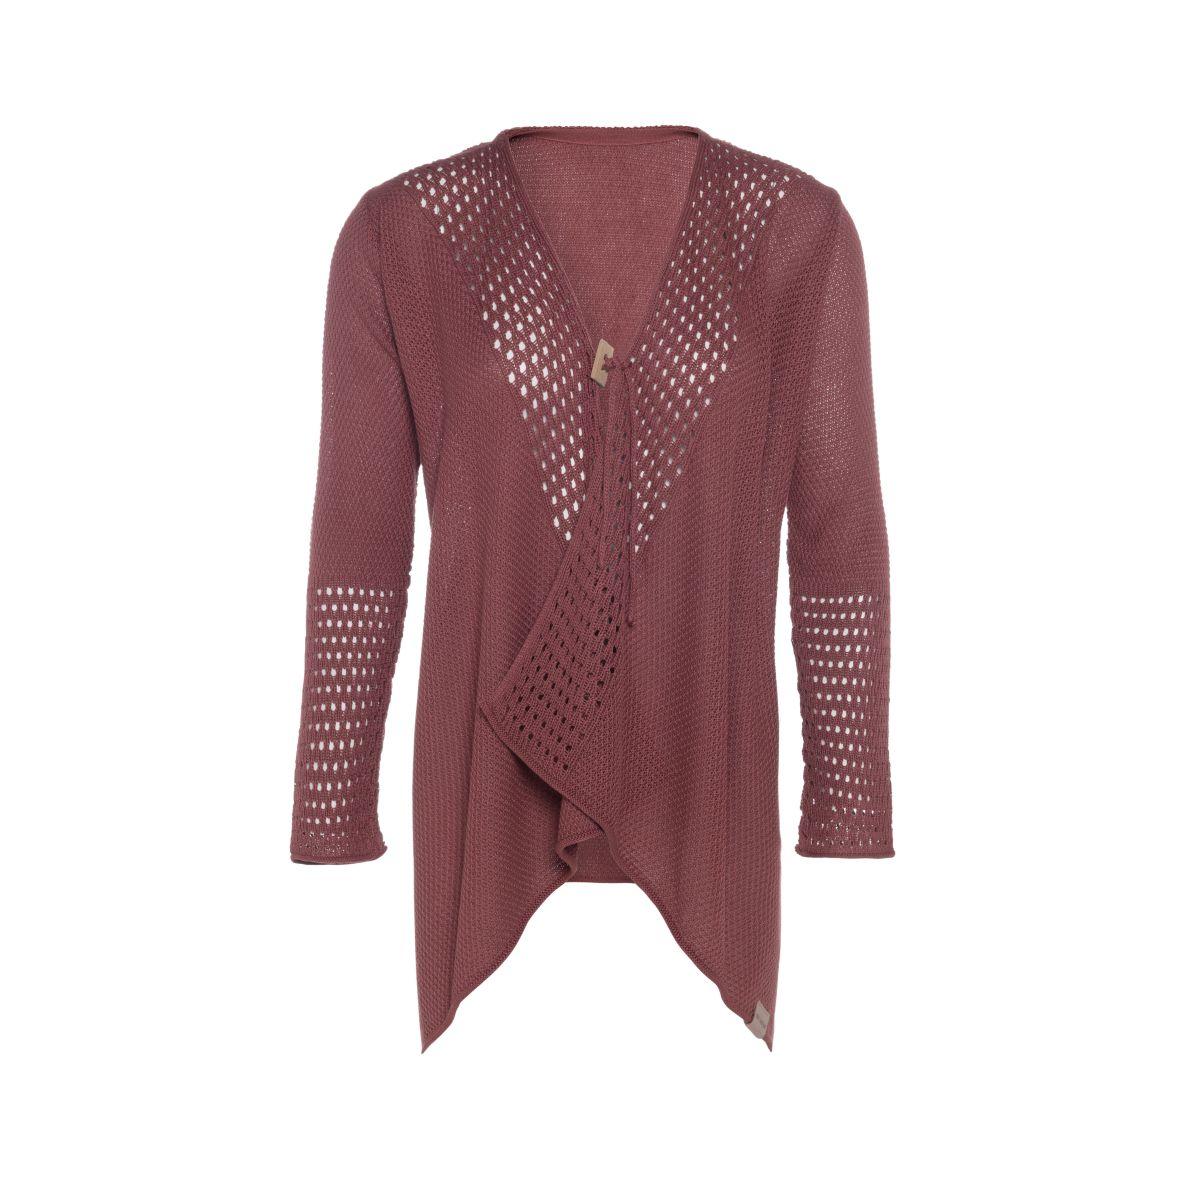 knit factory kf15208103851 april vest stone red 4042 1